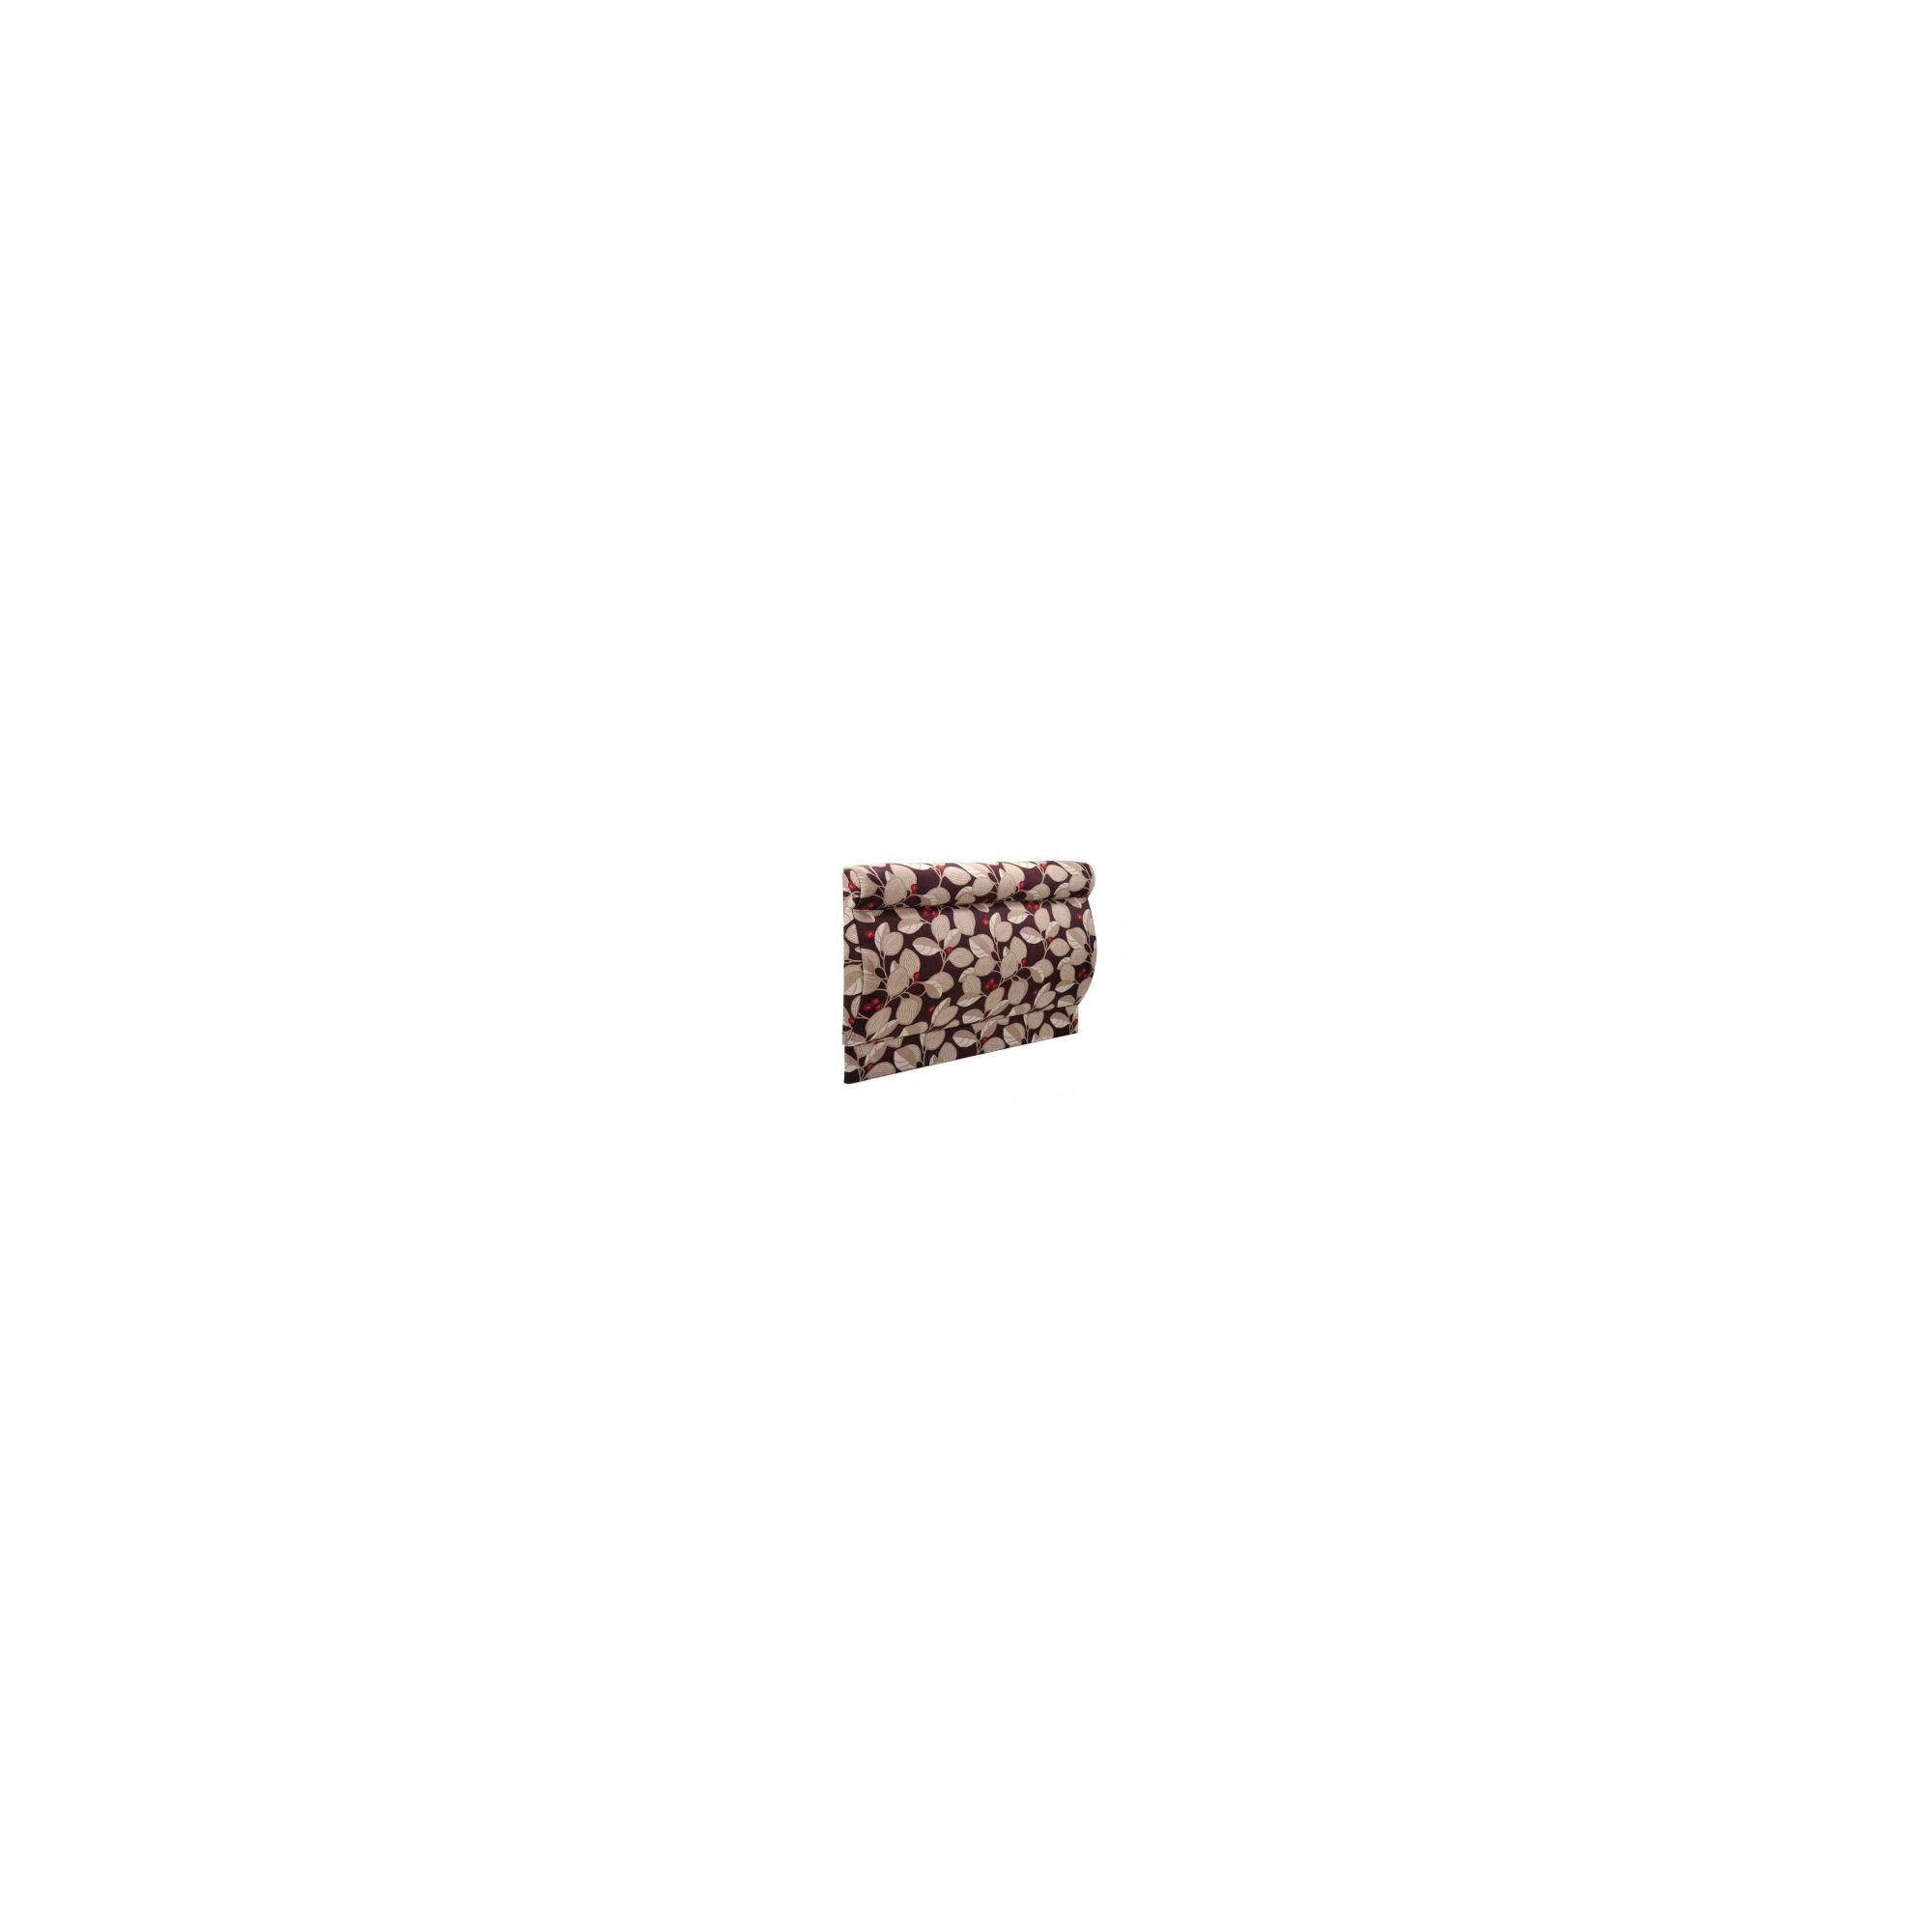 PC Upholstery Lima Headboard - Adelphine Hollyhock - 3' Single at Tesco Direct